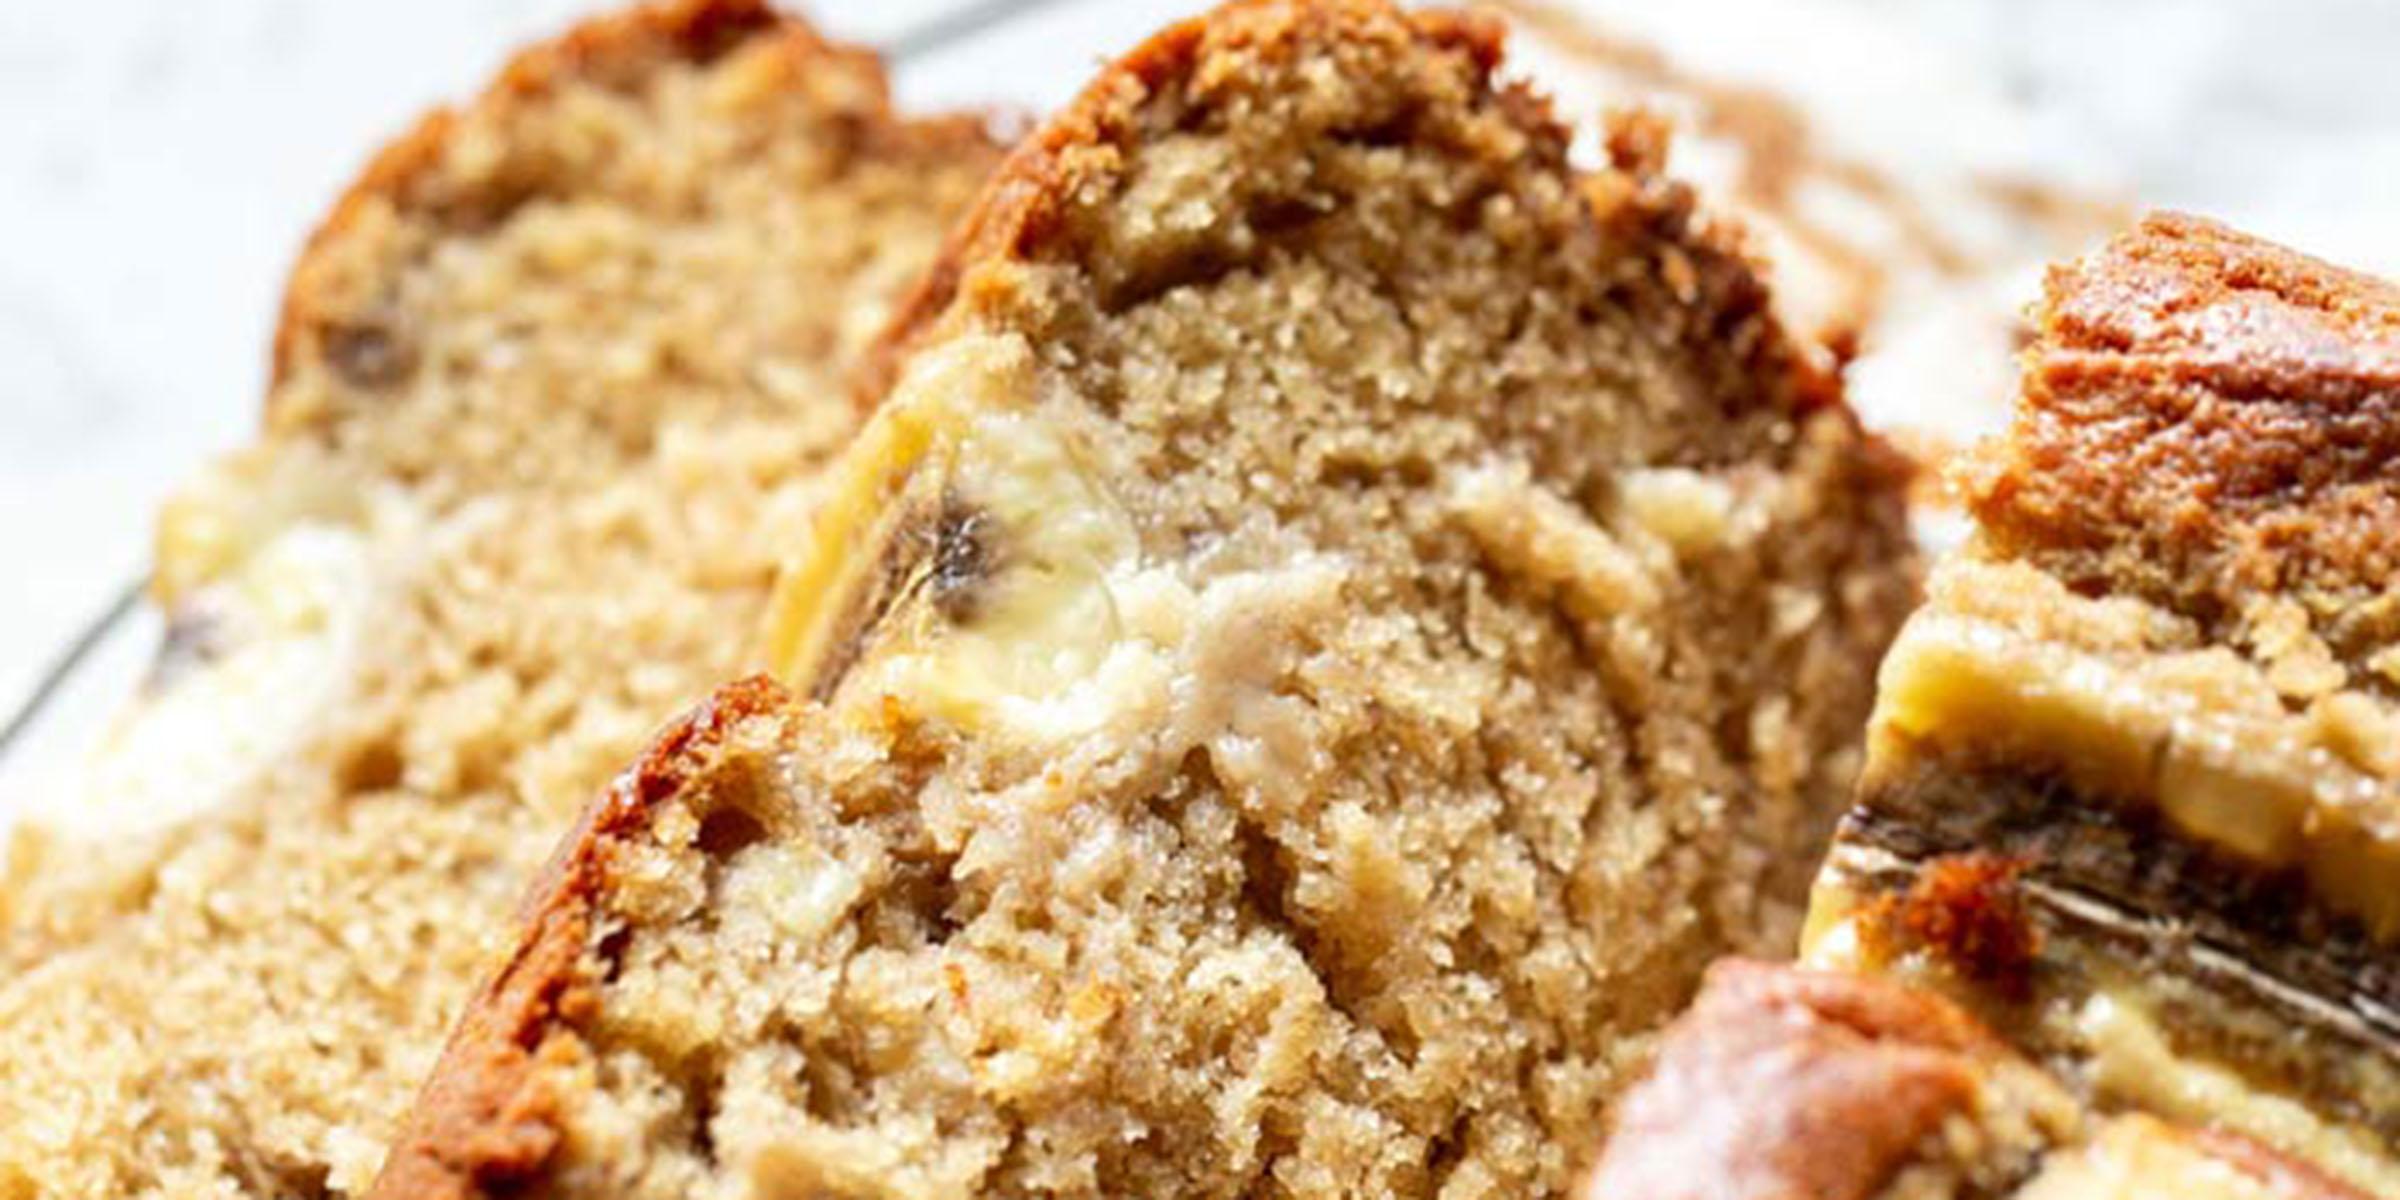 Use overripe bananas to make easy and delicious banana bread